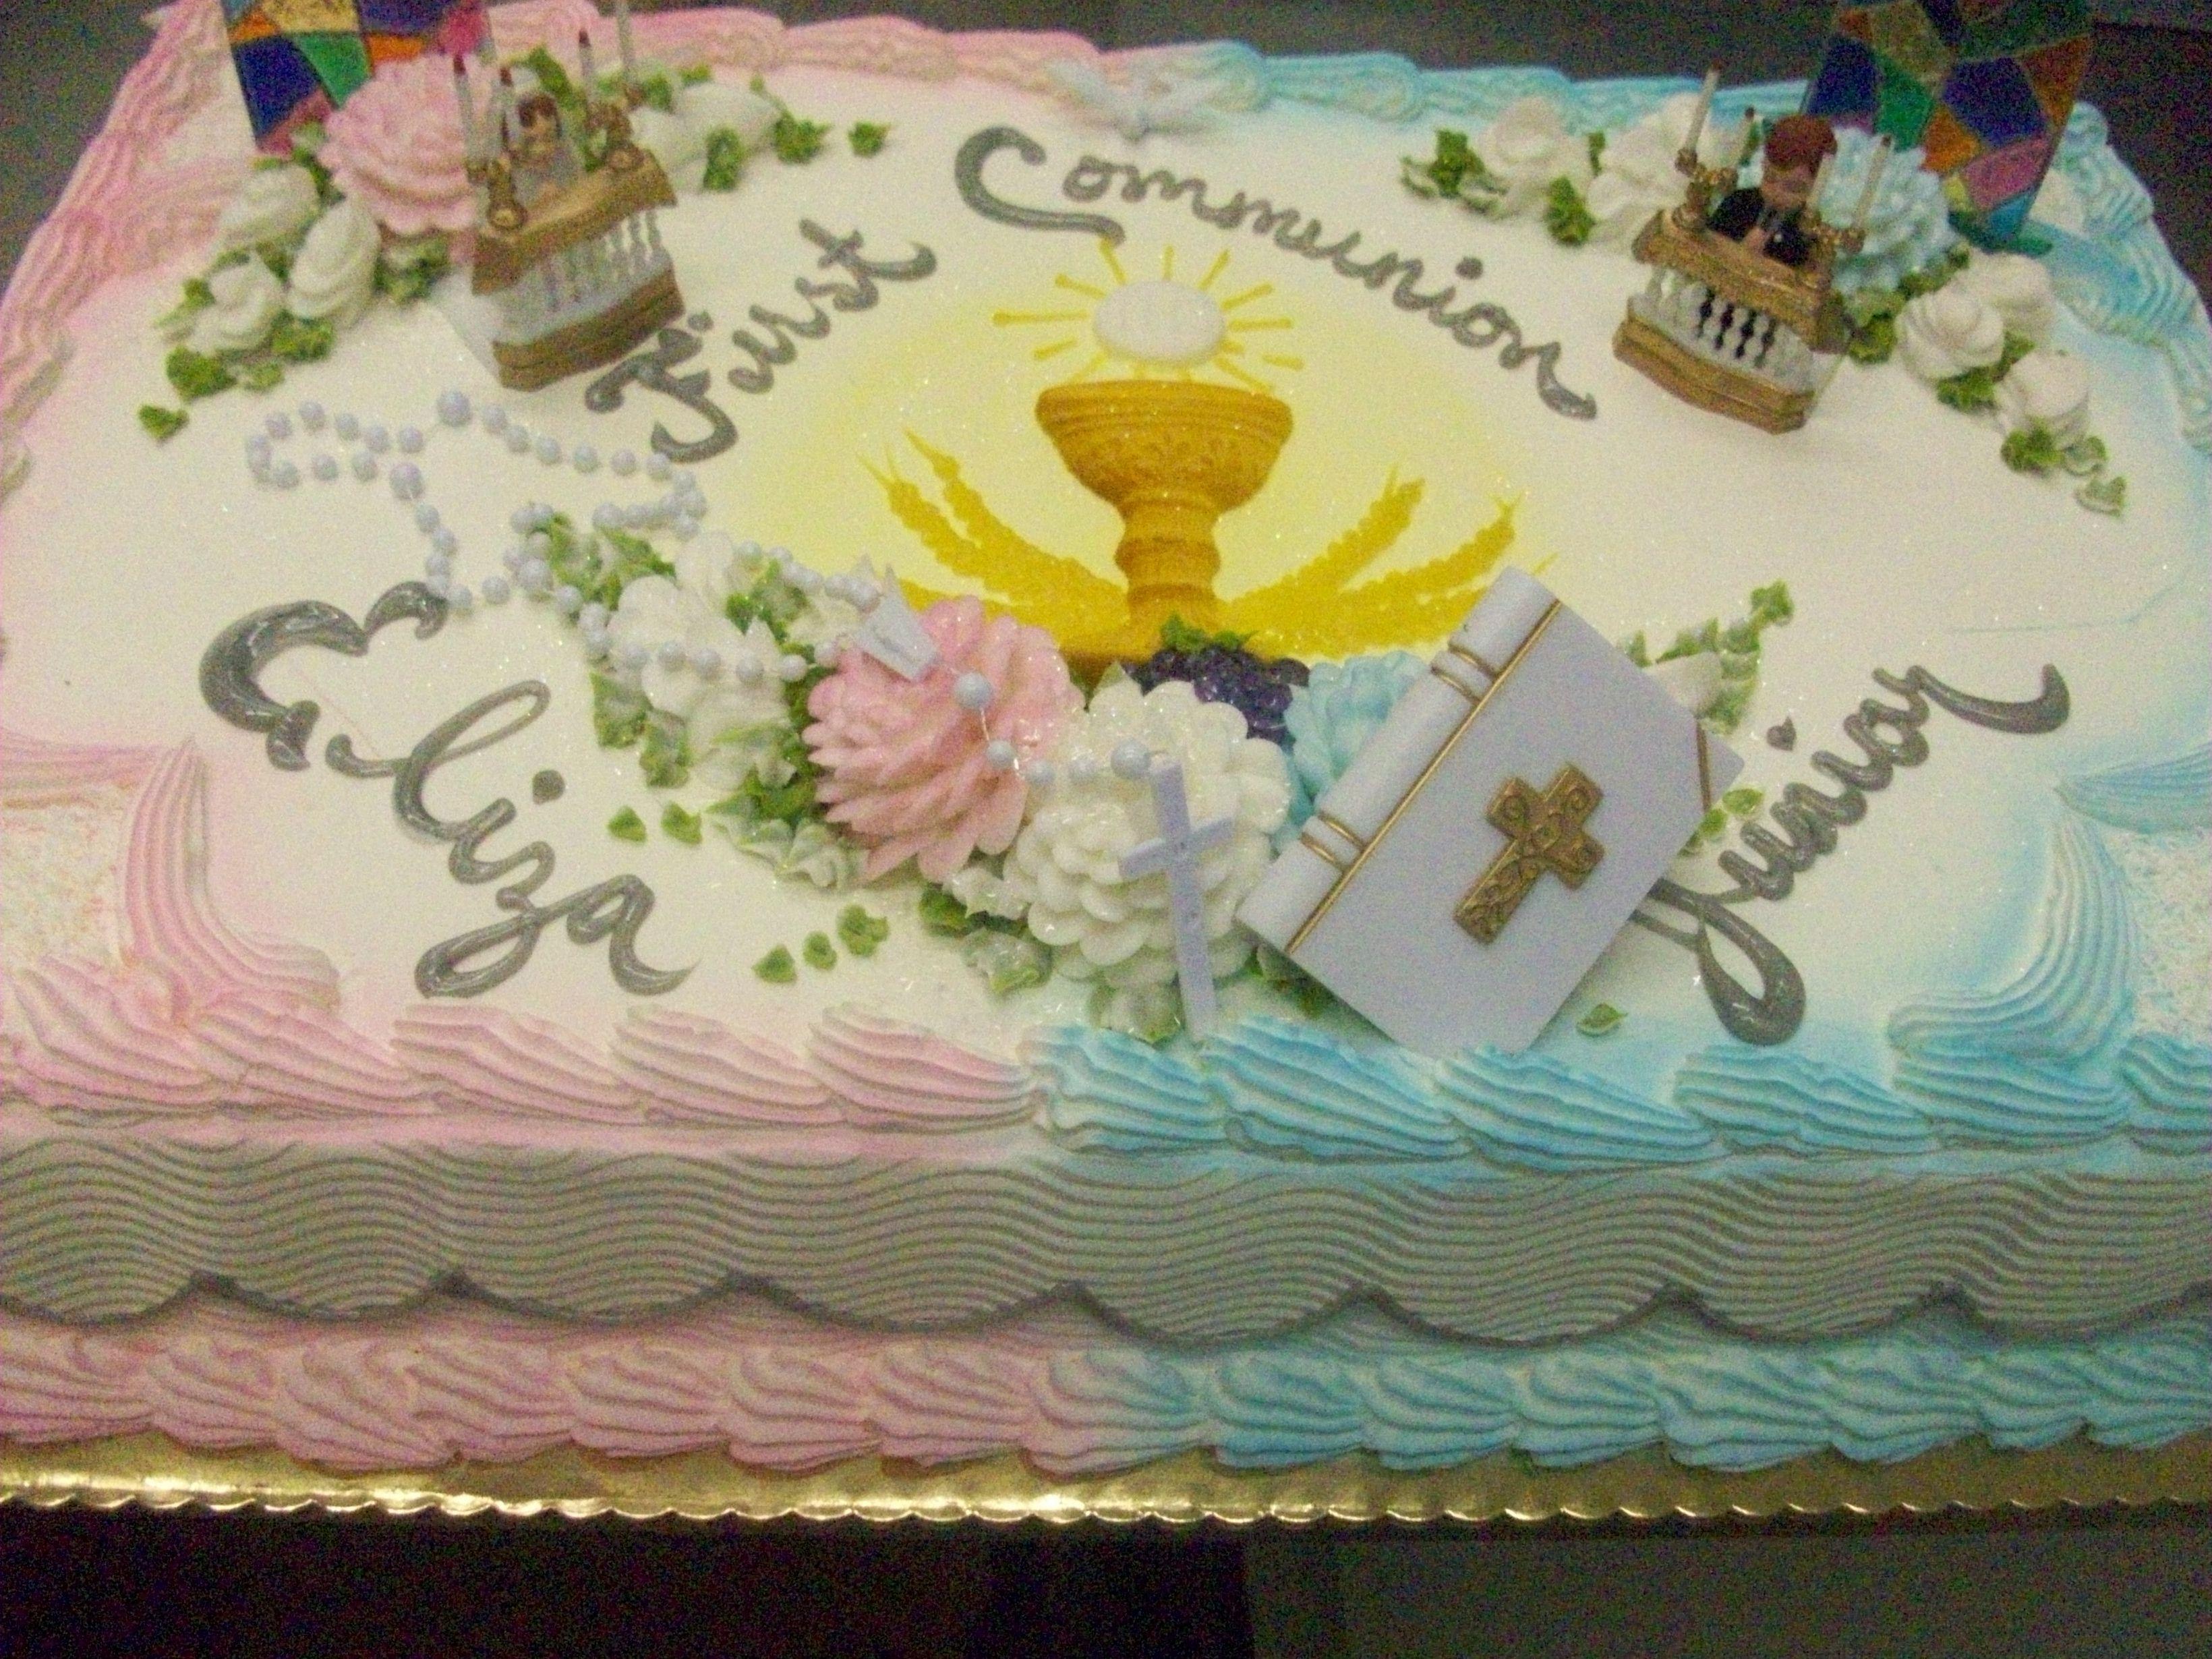 Calumet Bakery Boy And Girl Kneeling With Chalice Baptism Cake Christening Cake Christening